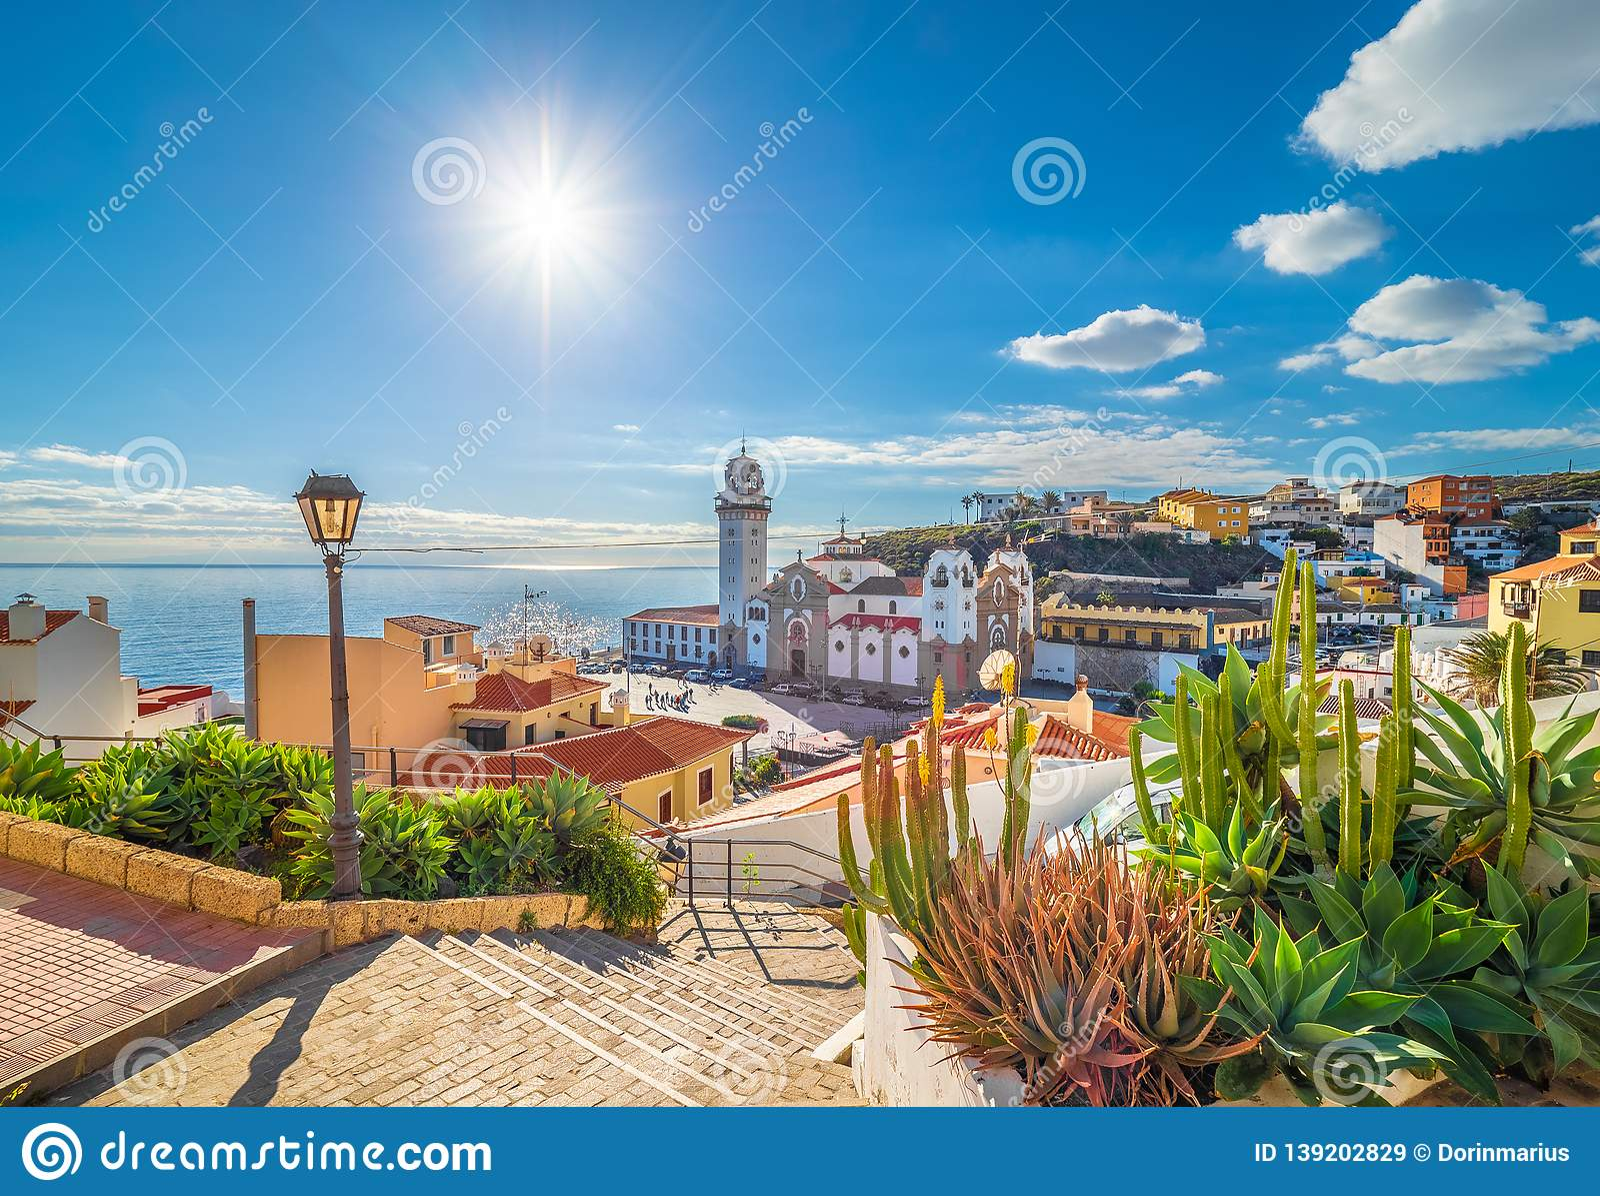 Candelaria town on Tenerife